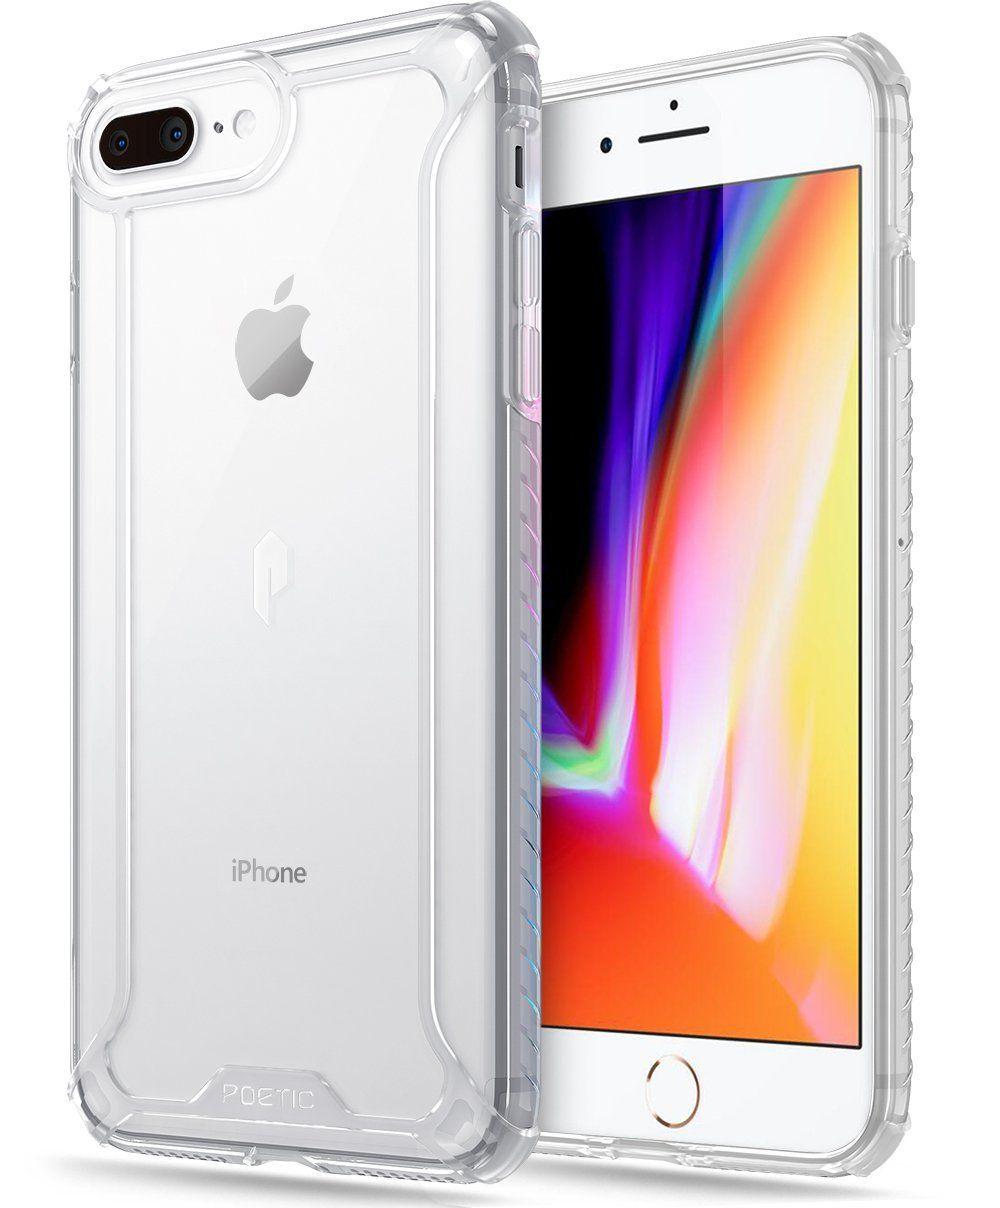 5ac8afba78 iPhone 7 Plus / iPhone 8 Plus Case, POETIC Affinity Series Premium Thin/No  Bulk/Clear/Dual material Protective Bumper Case for Apple iPhone 7 Plus  (2016) ...